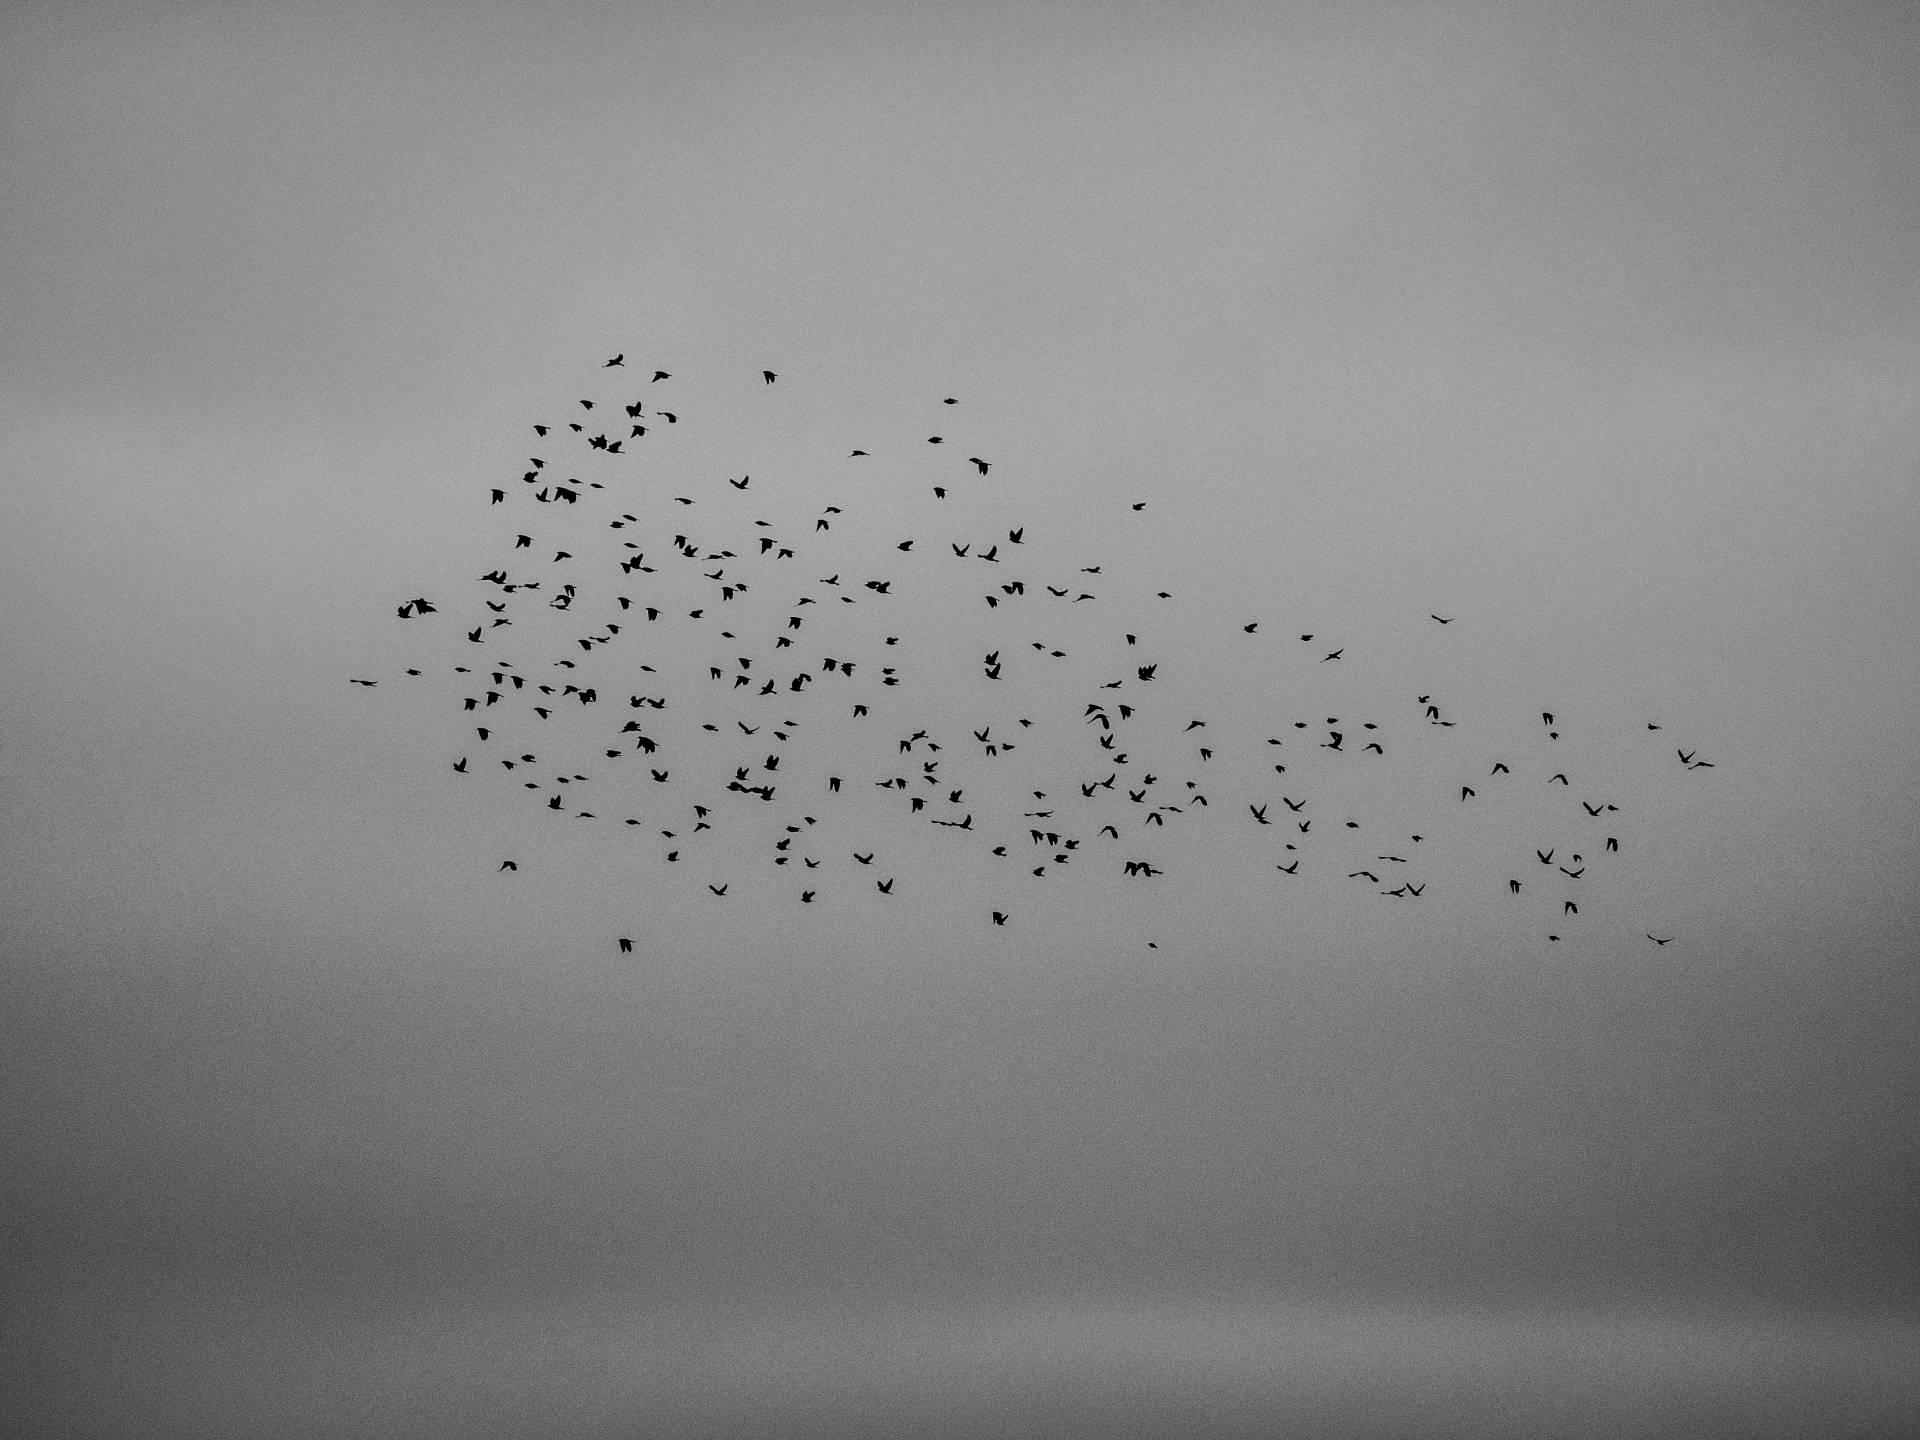 Flock of Birds in BW